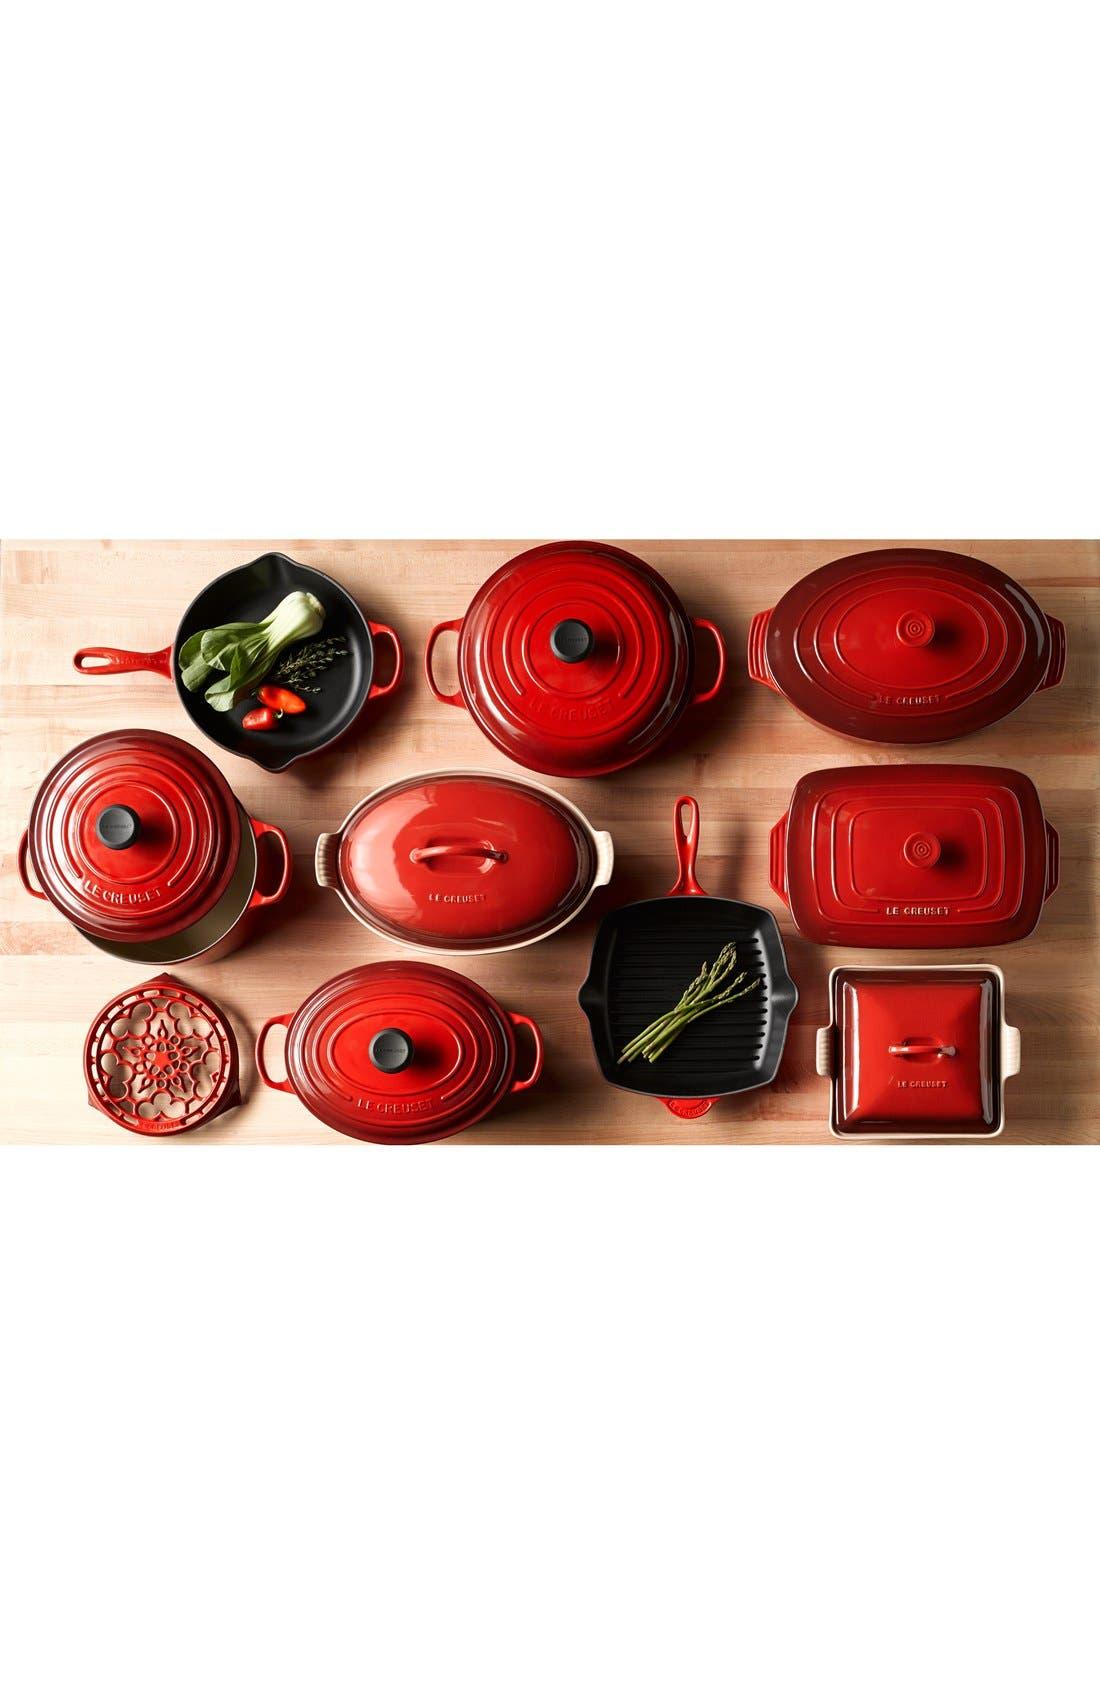 LE CREUSET,                             Signature 5 1/2 Quart Round Enamel Cast Iron French/Dutch Oven,                             Alternate thumbnail 7, color,                             INDIGO